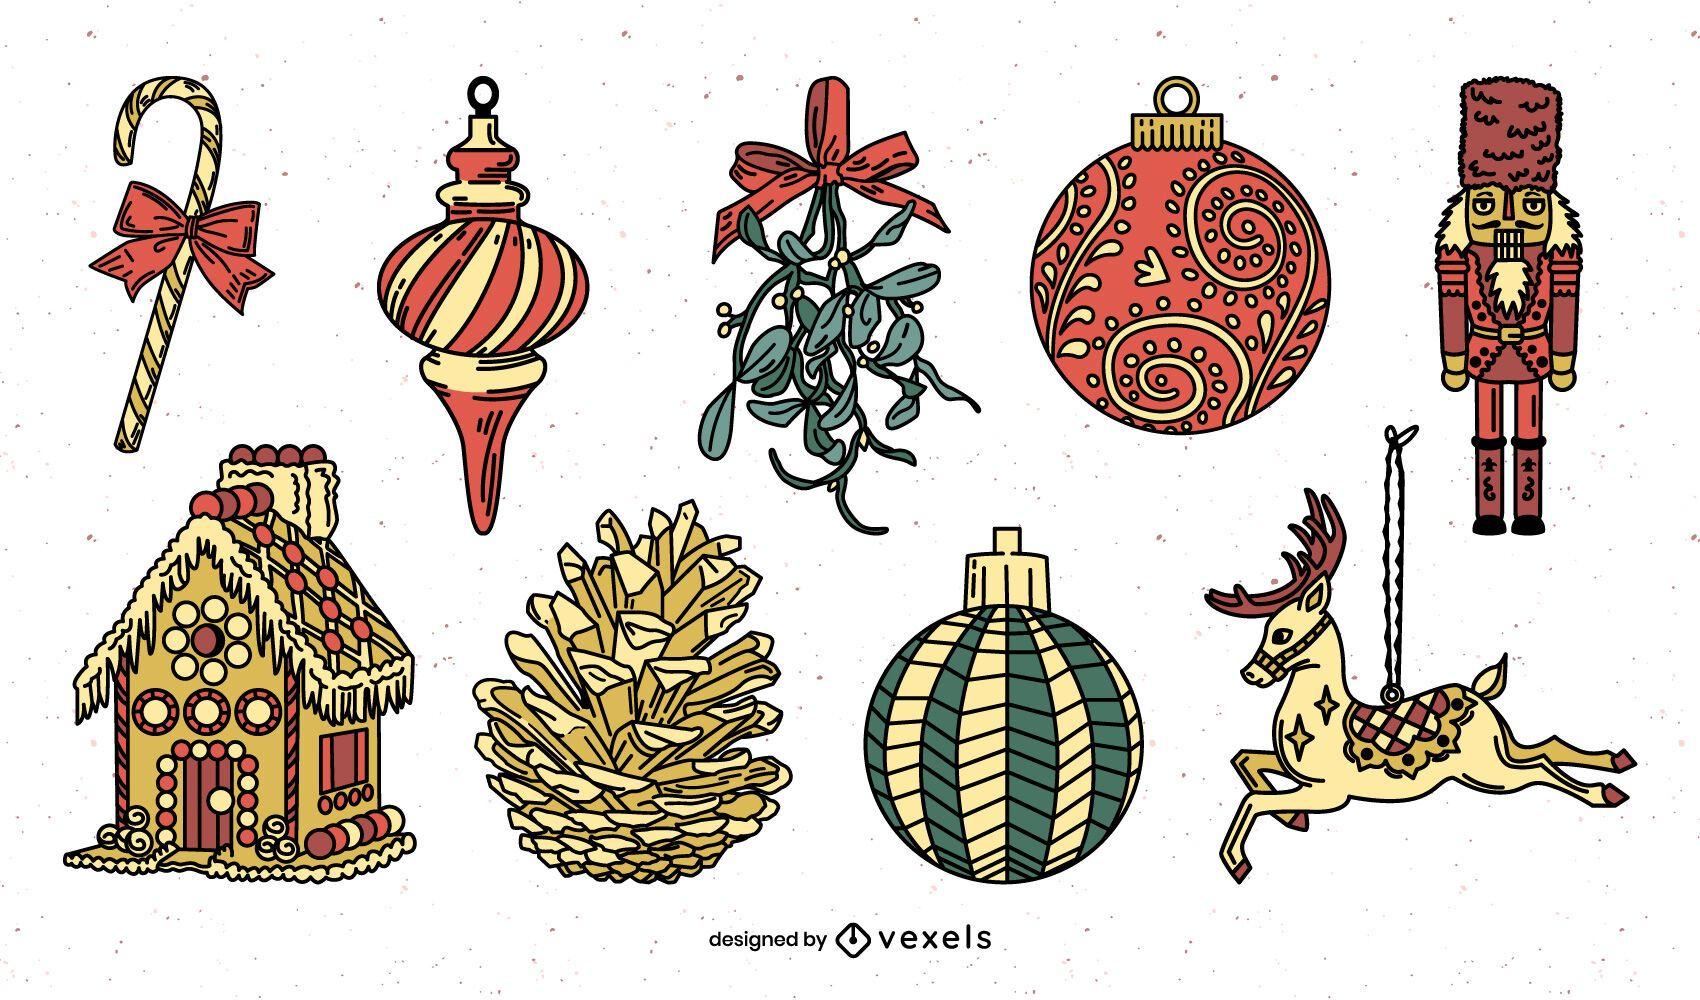 Paquete detallado de adornos navideños